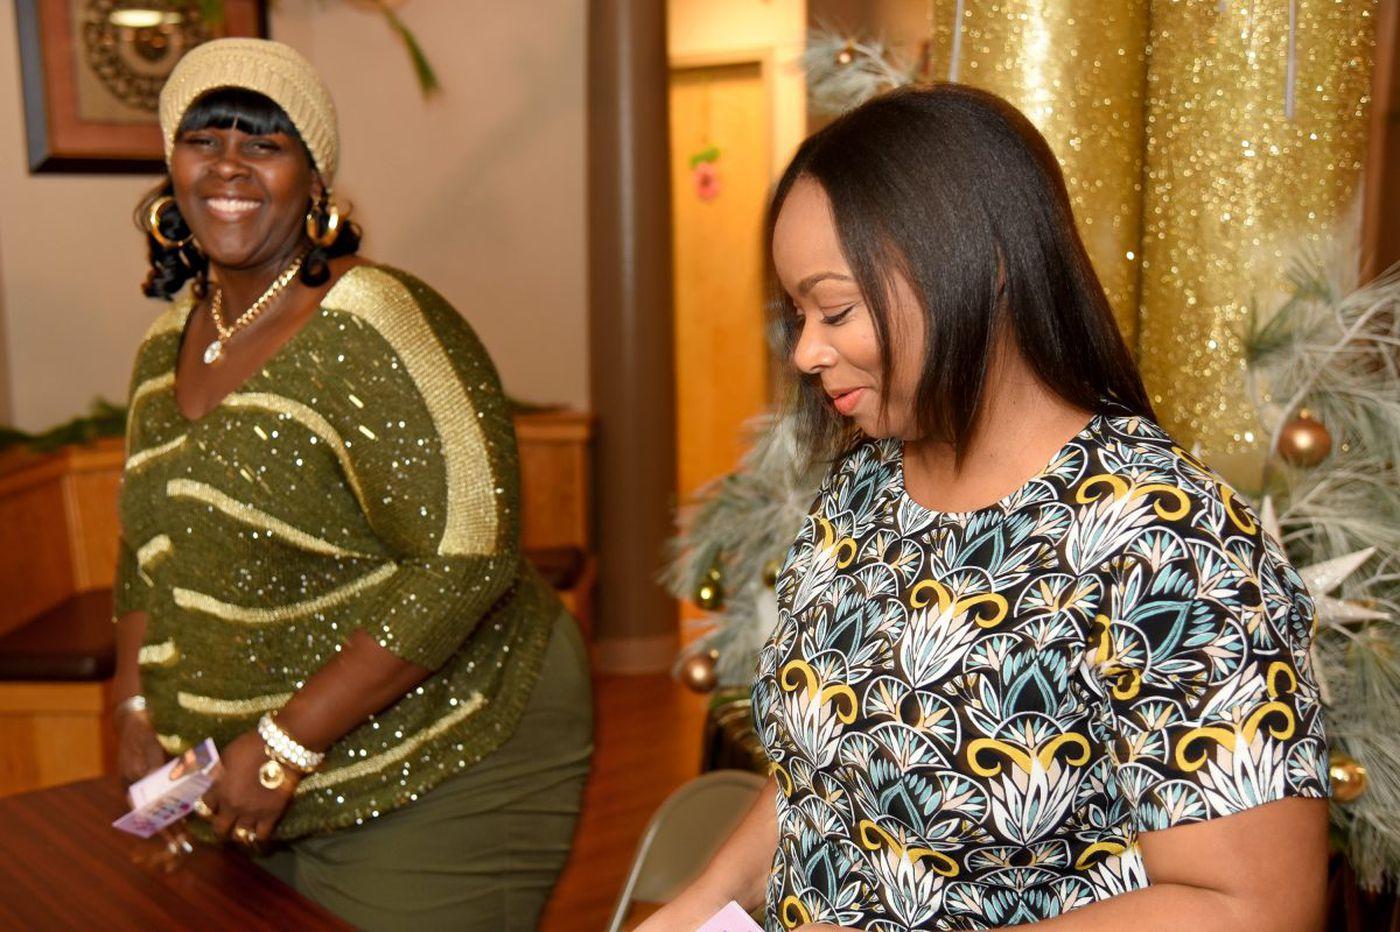 To lower infant mortality in Camden, neighborhood women educate each other